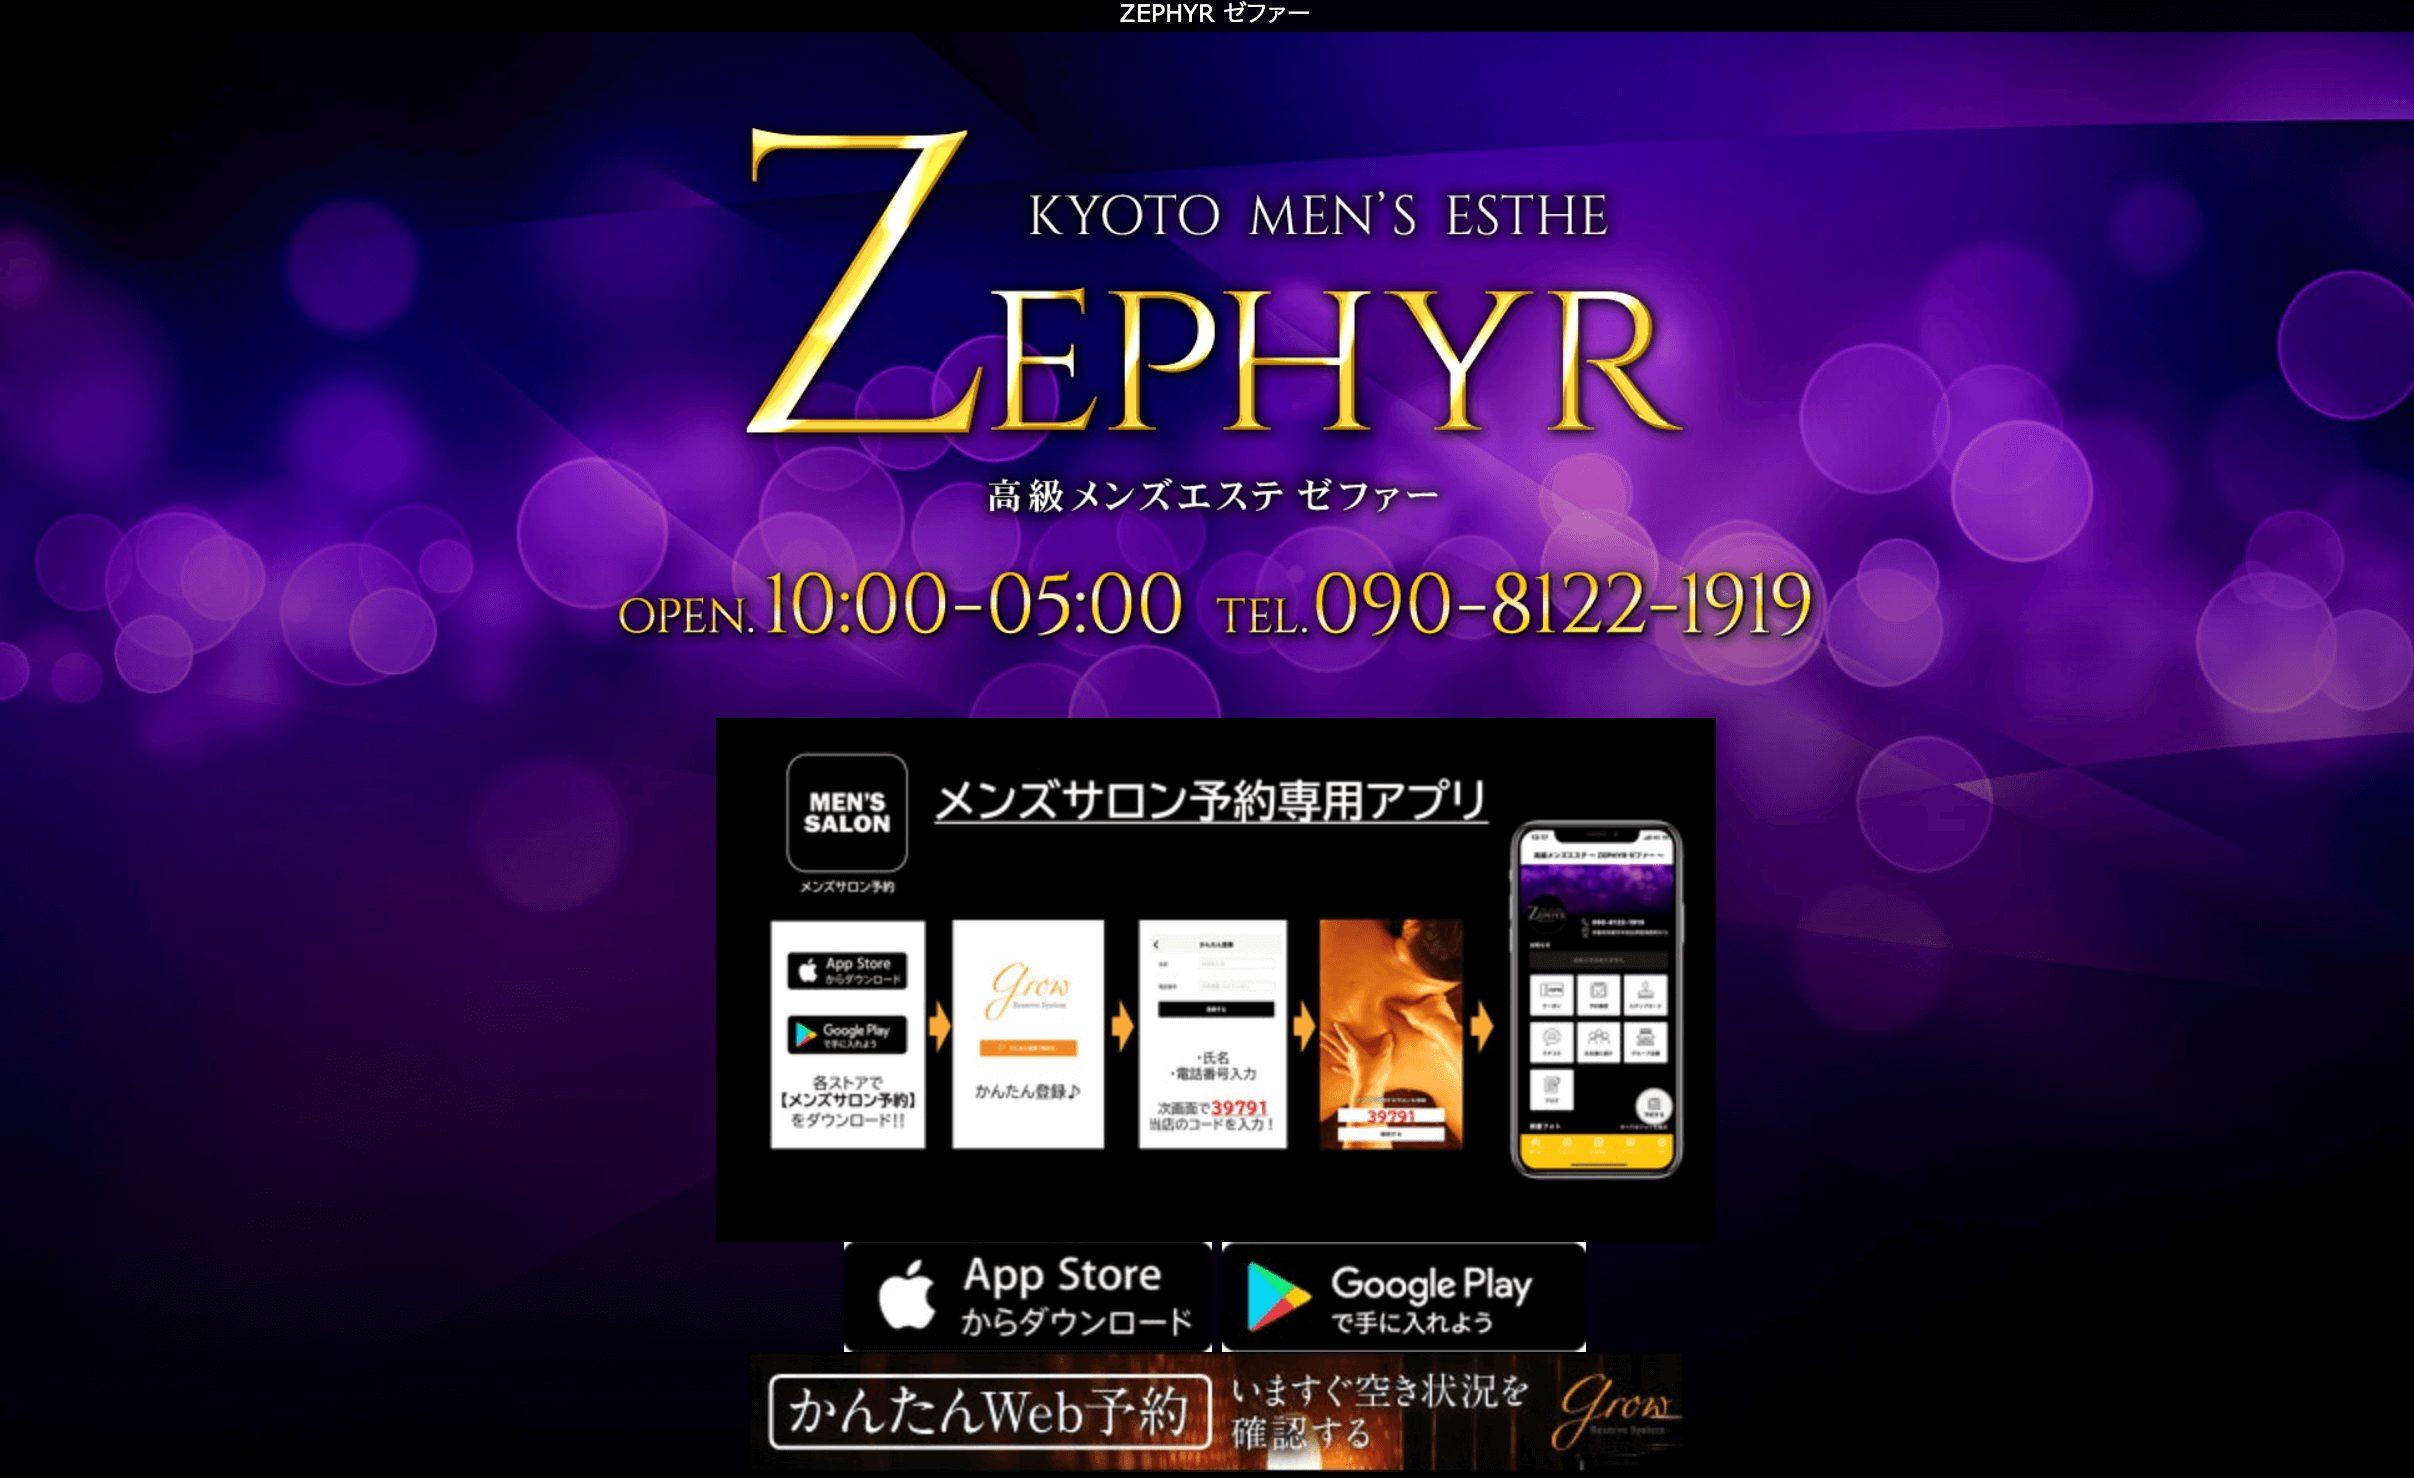 ZEPHYR(ゼファー)